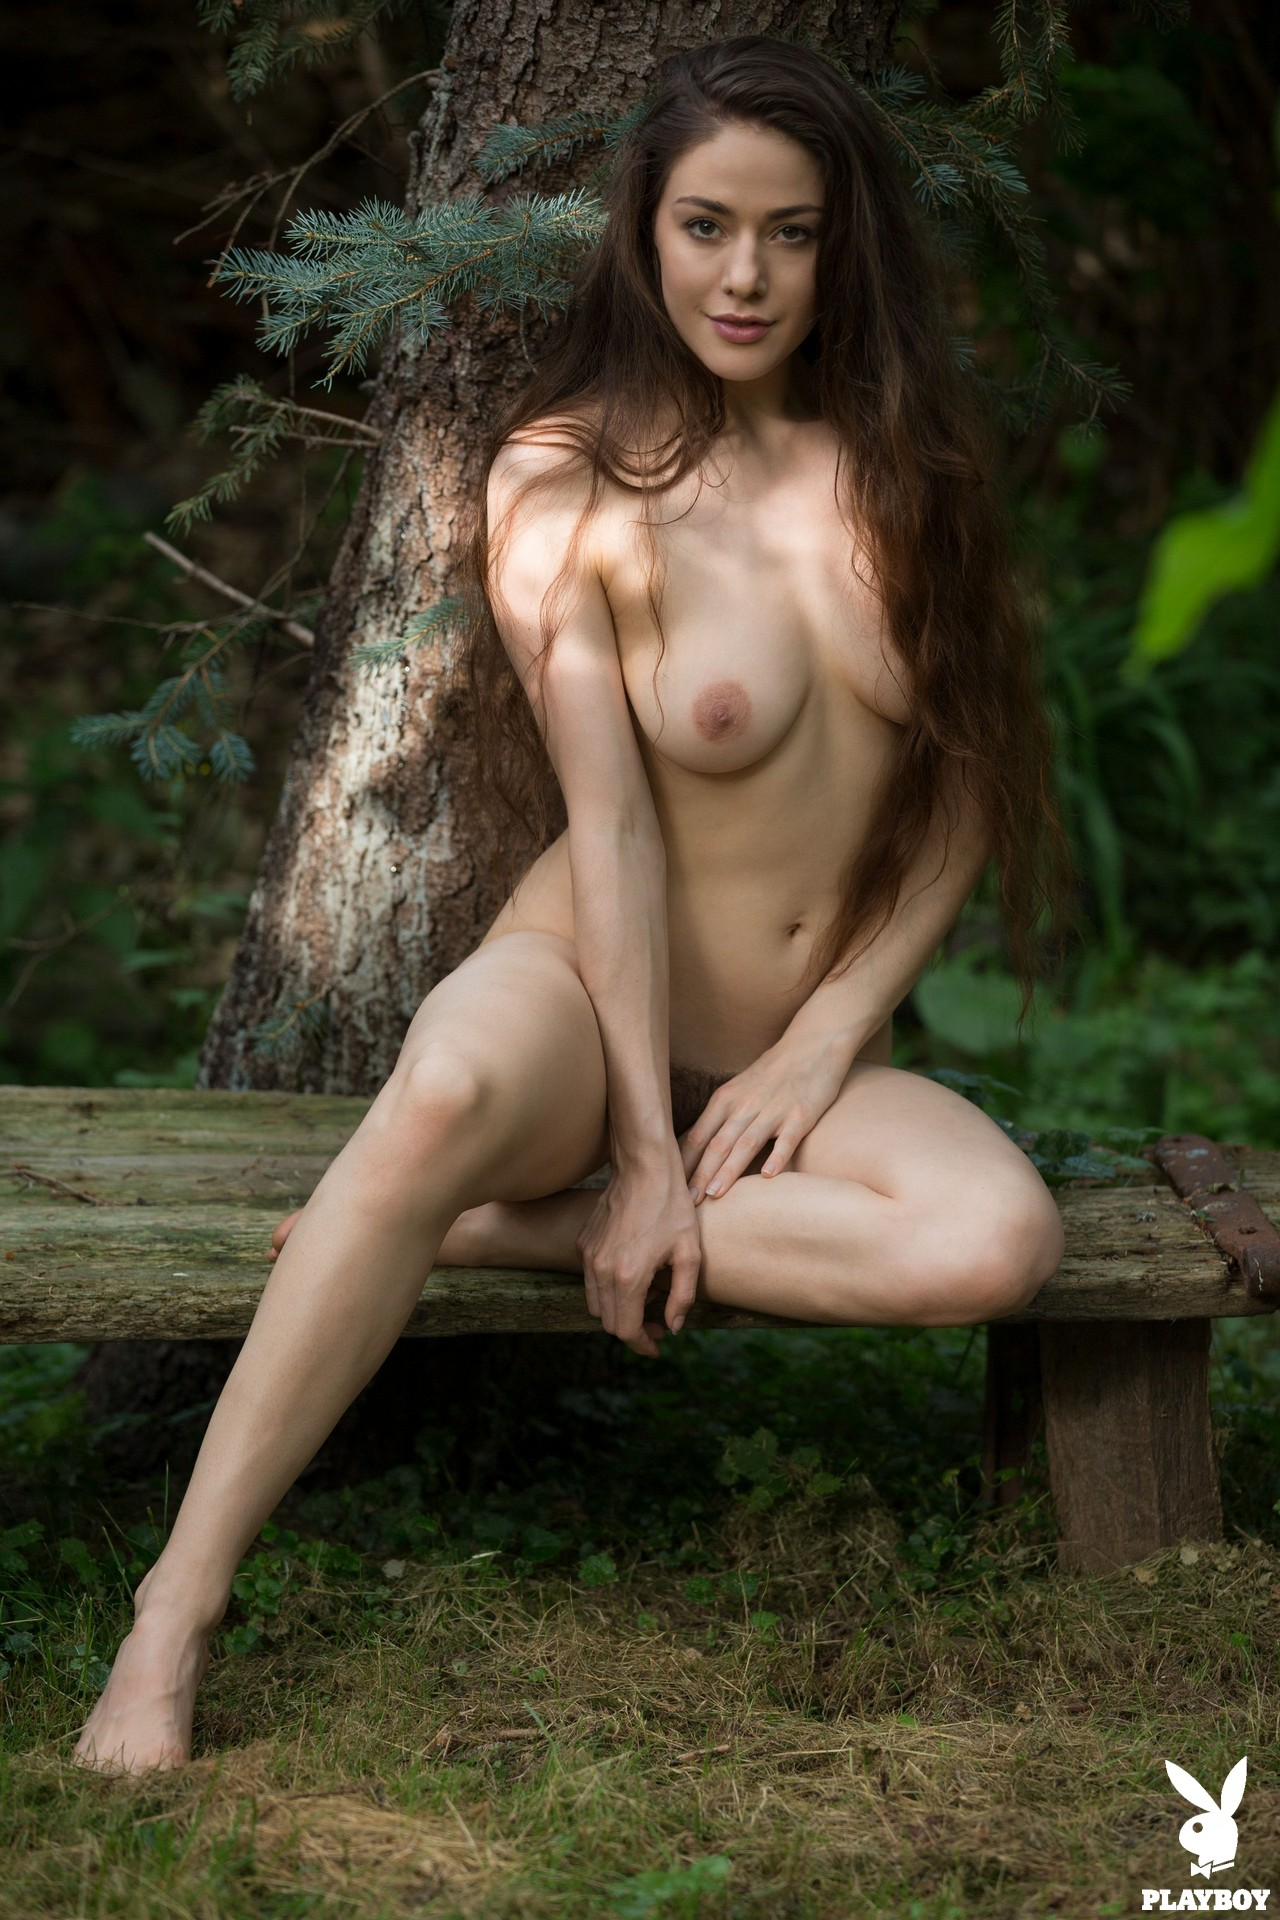 Joy Draiki in Mystic Escape - Playboy Plus 21